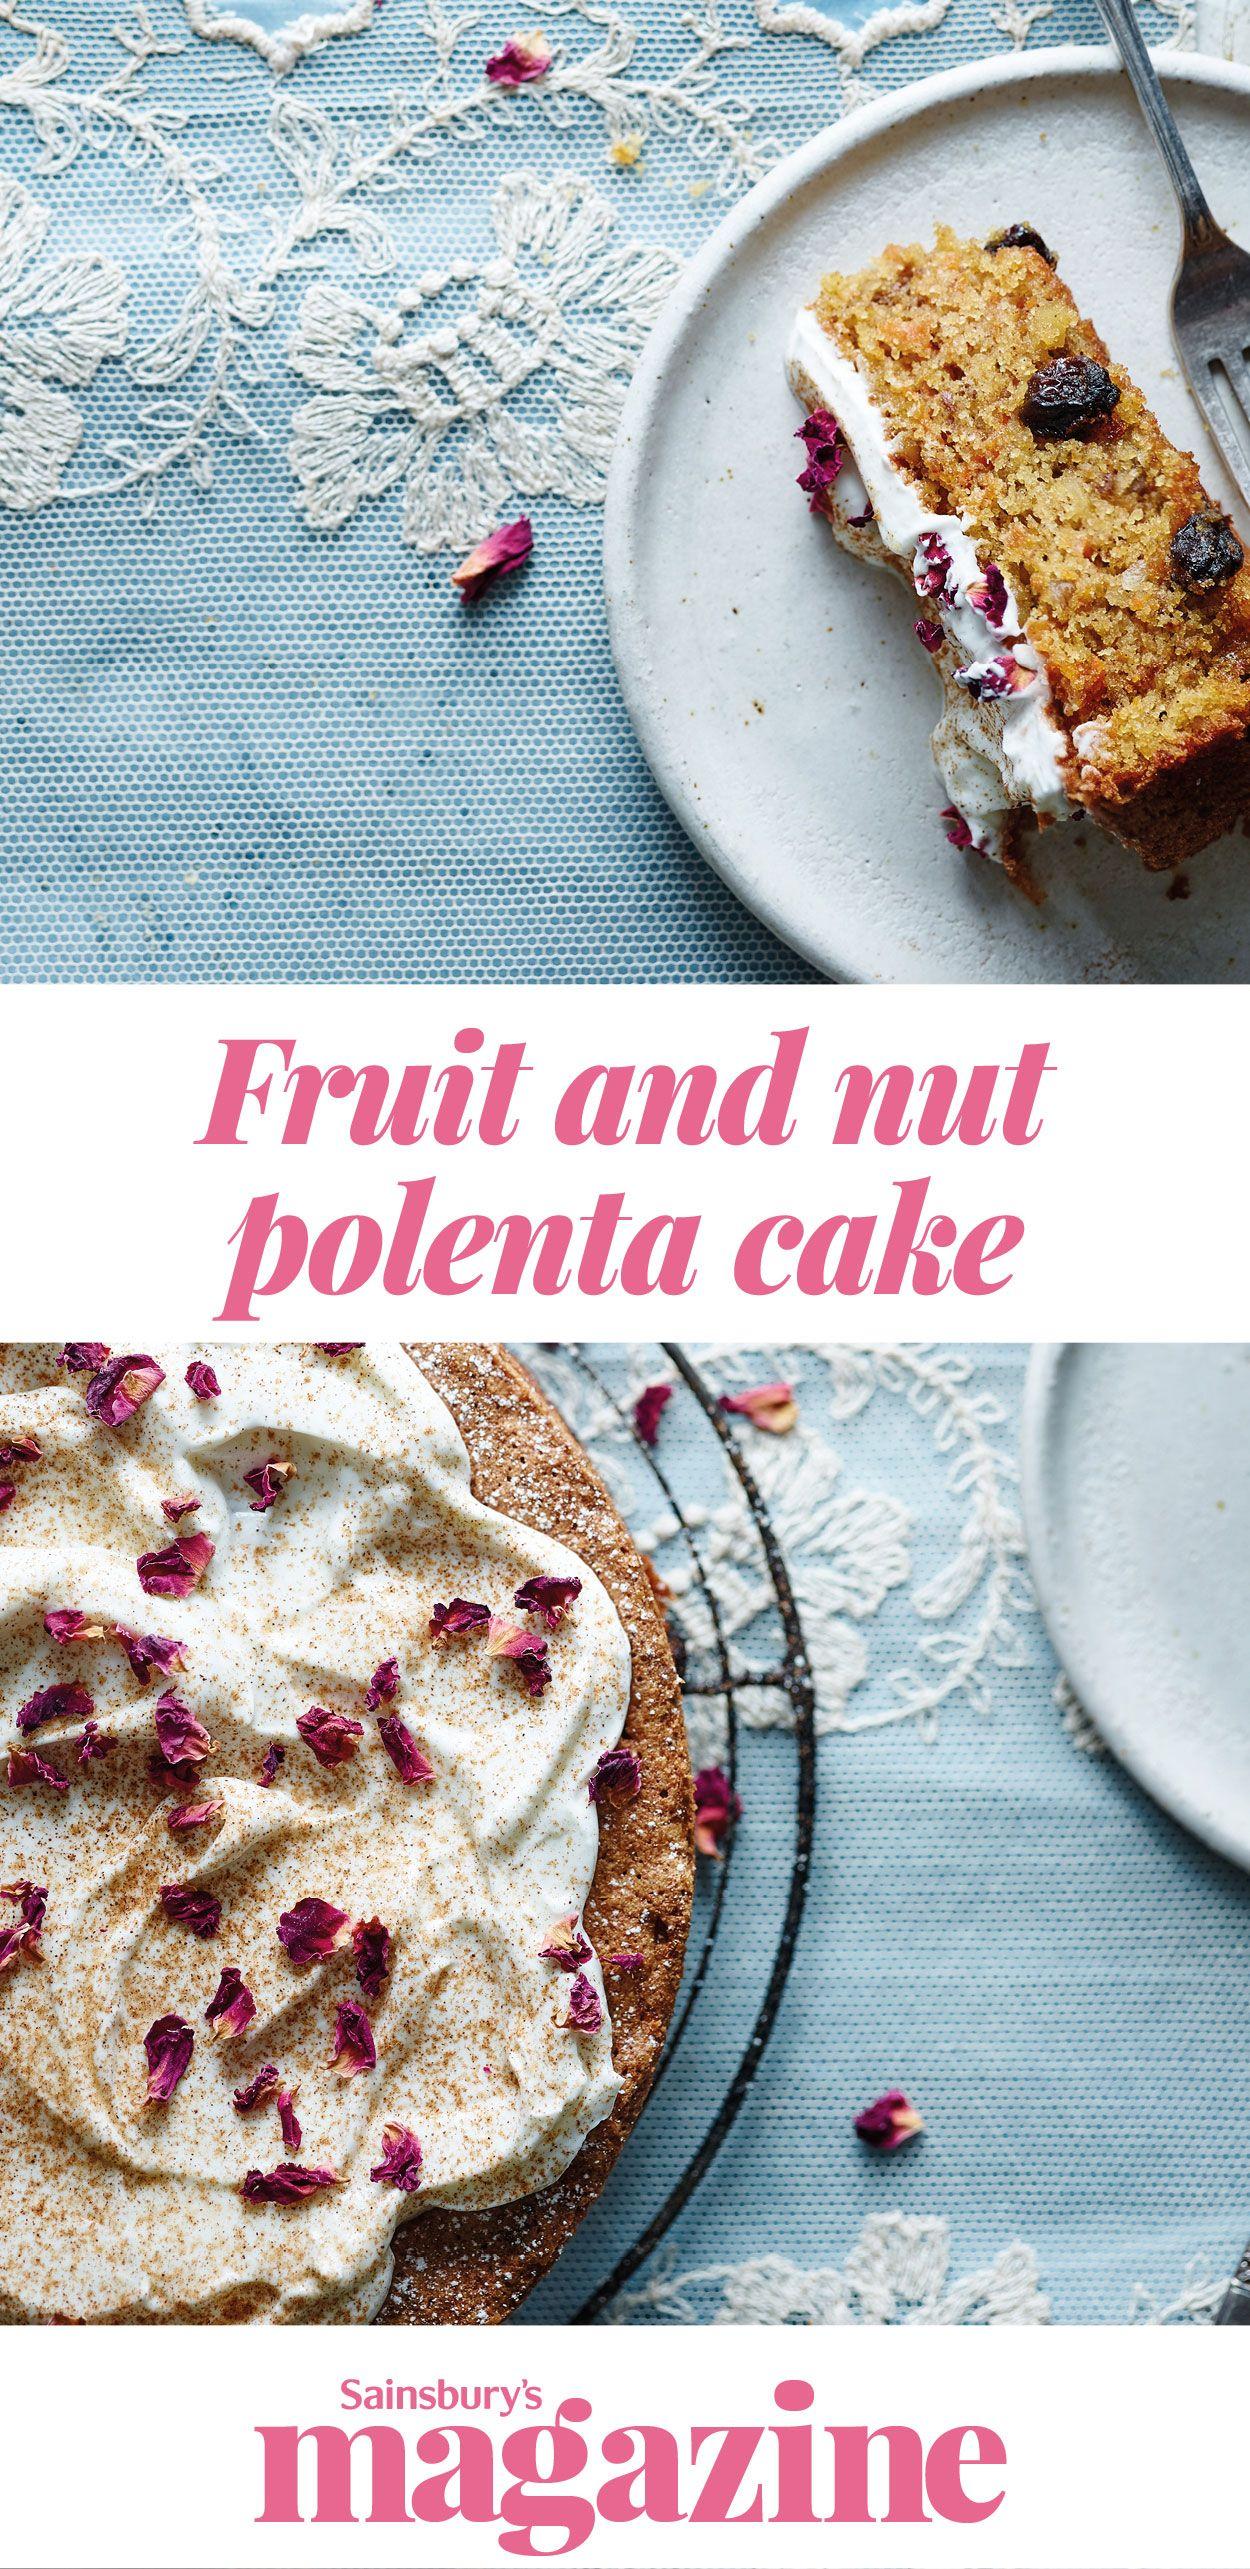 Fruit and nut polenta cake recipe delicious gluten